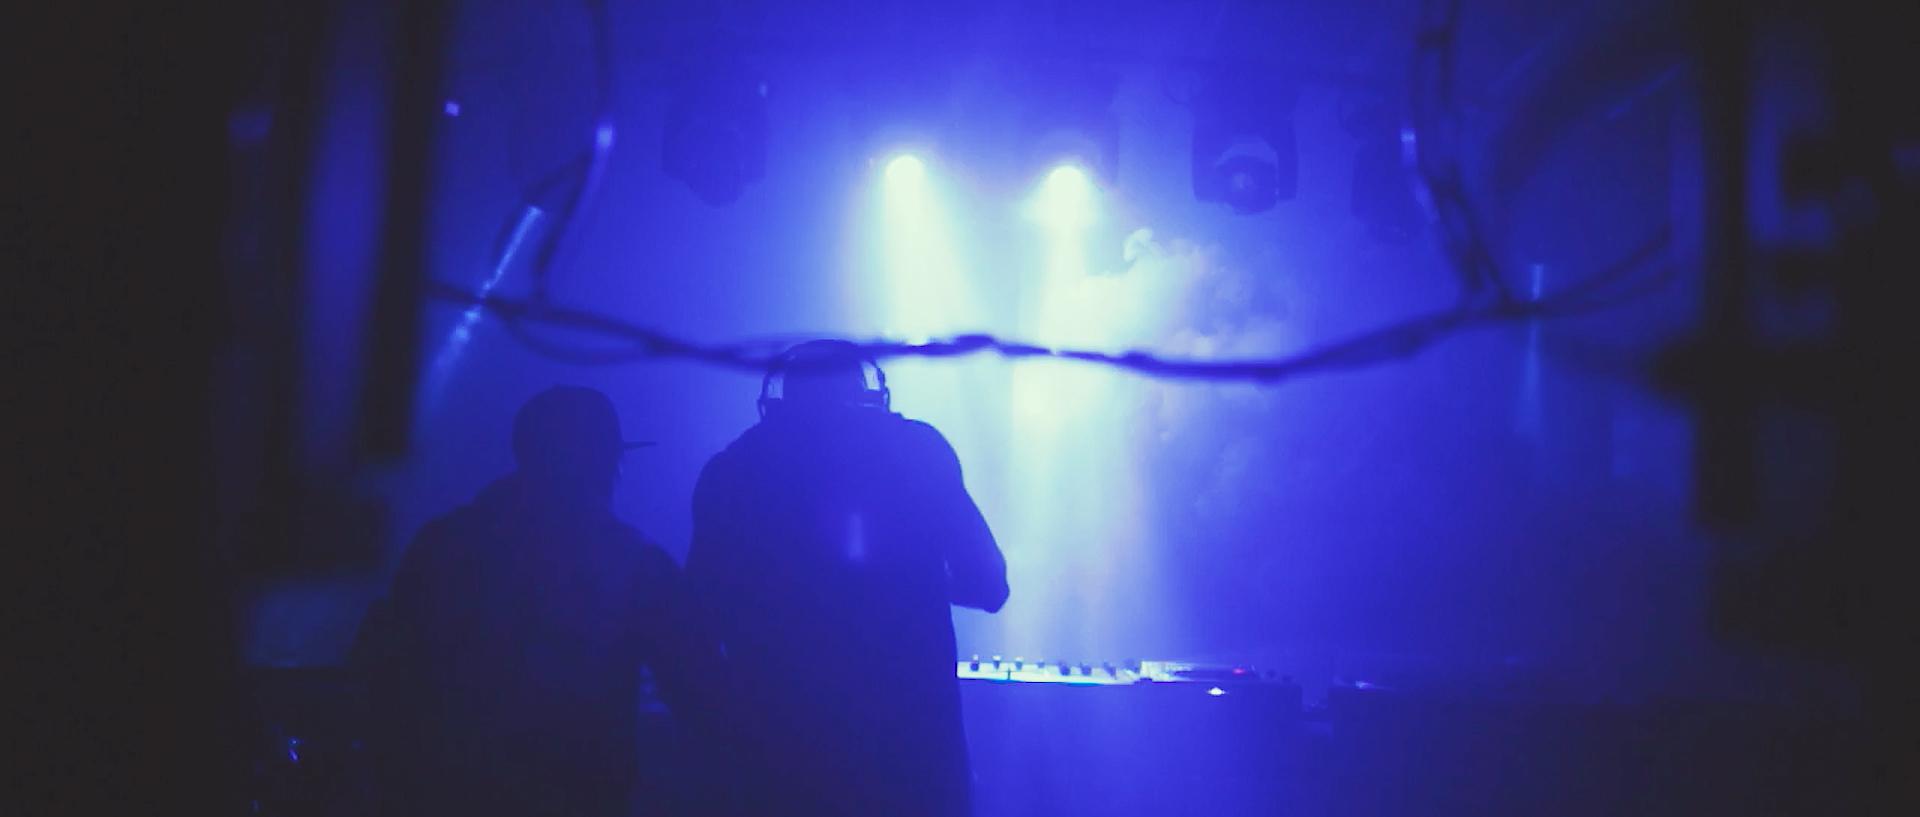 Tadeo Acapulco Shore - MTV - DJ - Stills - Cinema - Dp - Frame- Cinematographer - Miguel Bautista - Production - Filmmaking - Cine 005.jpg